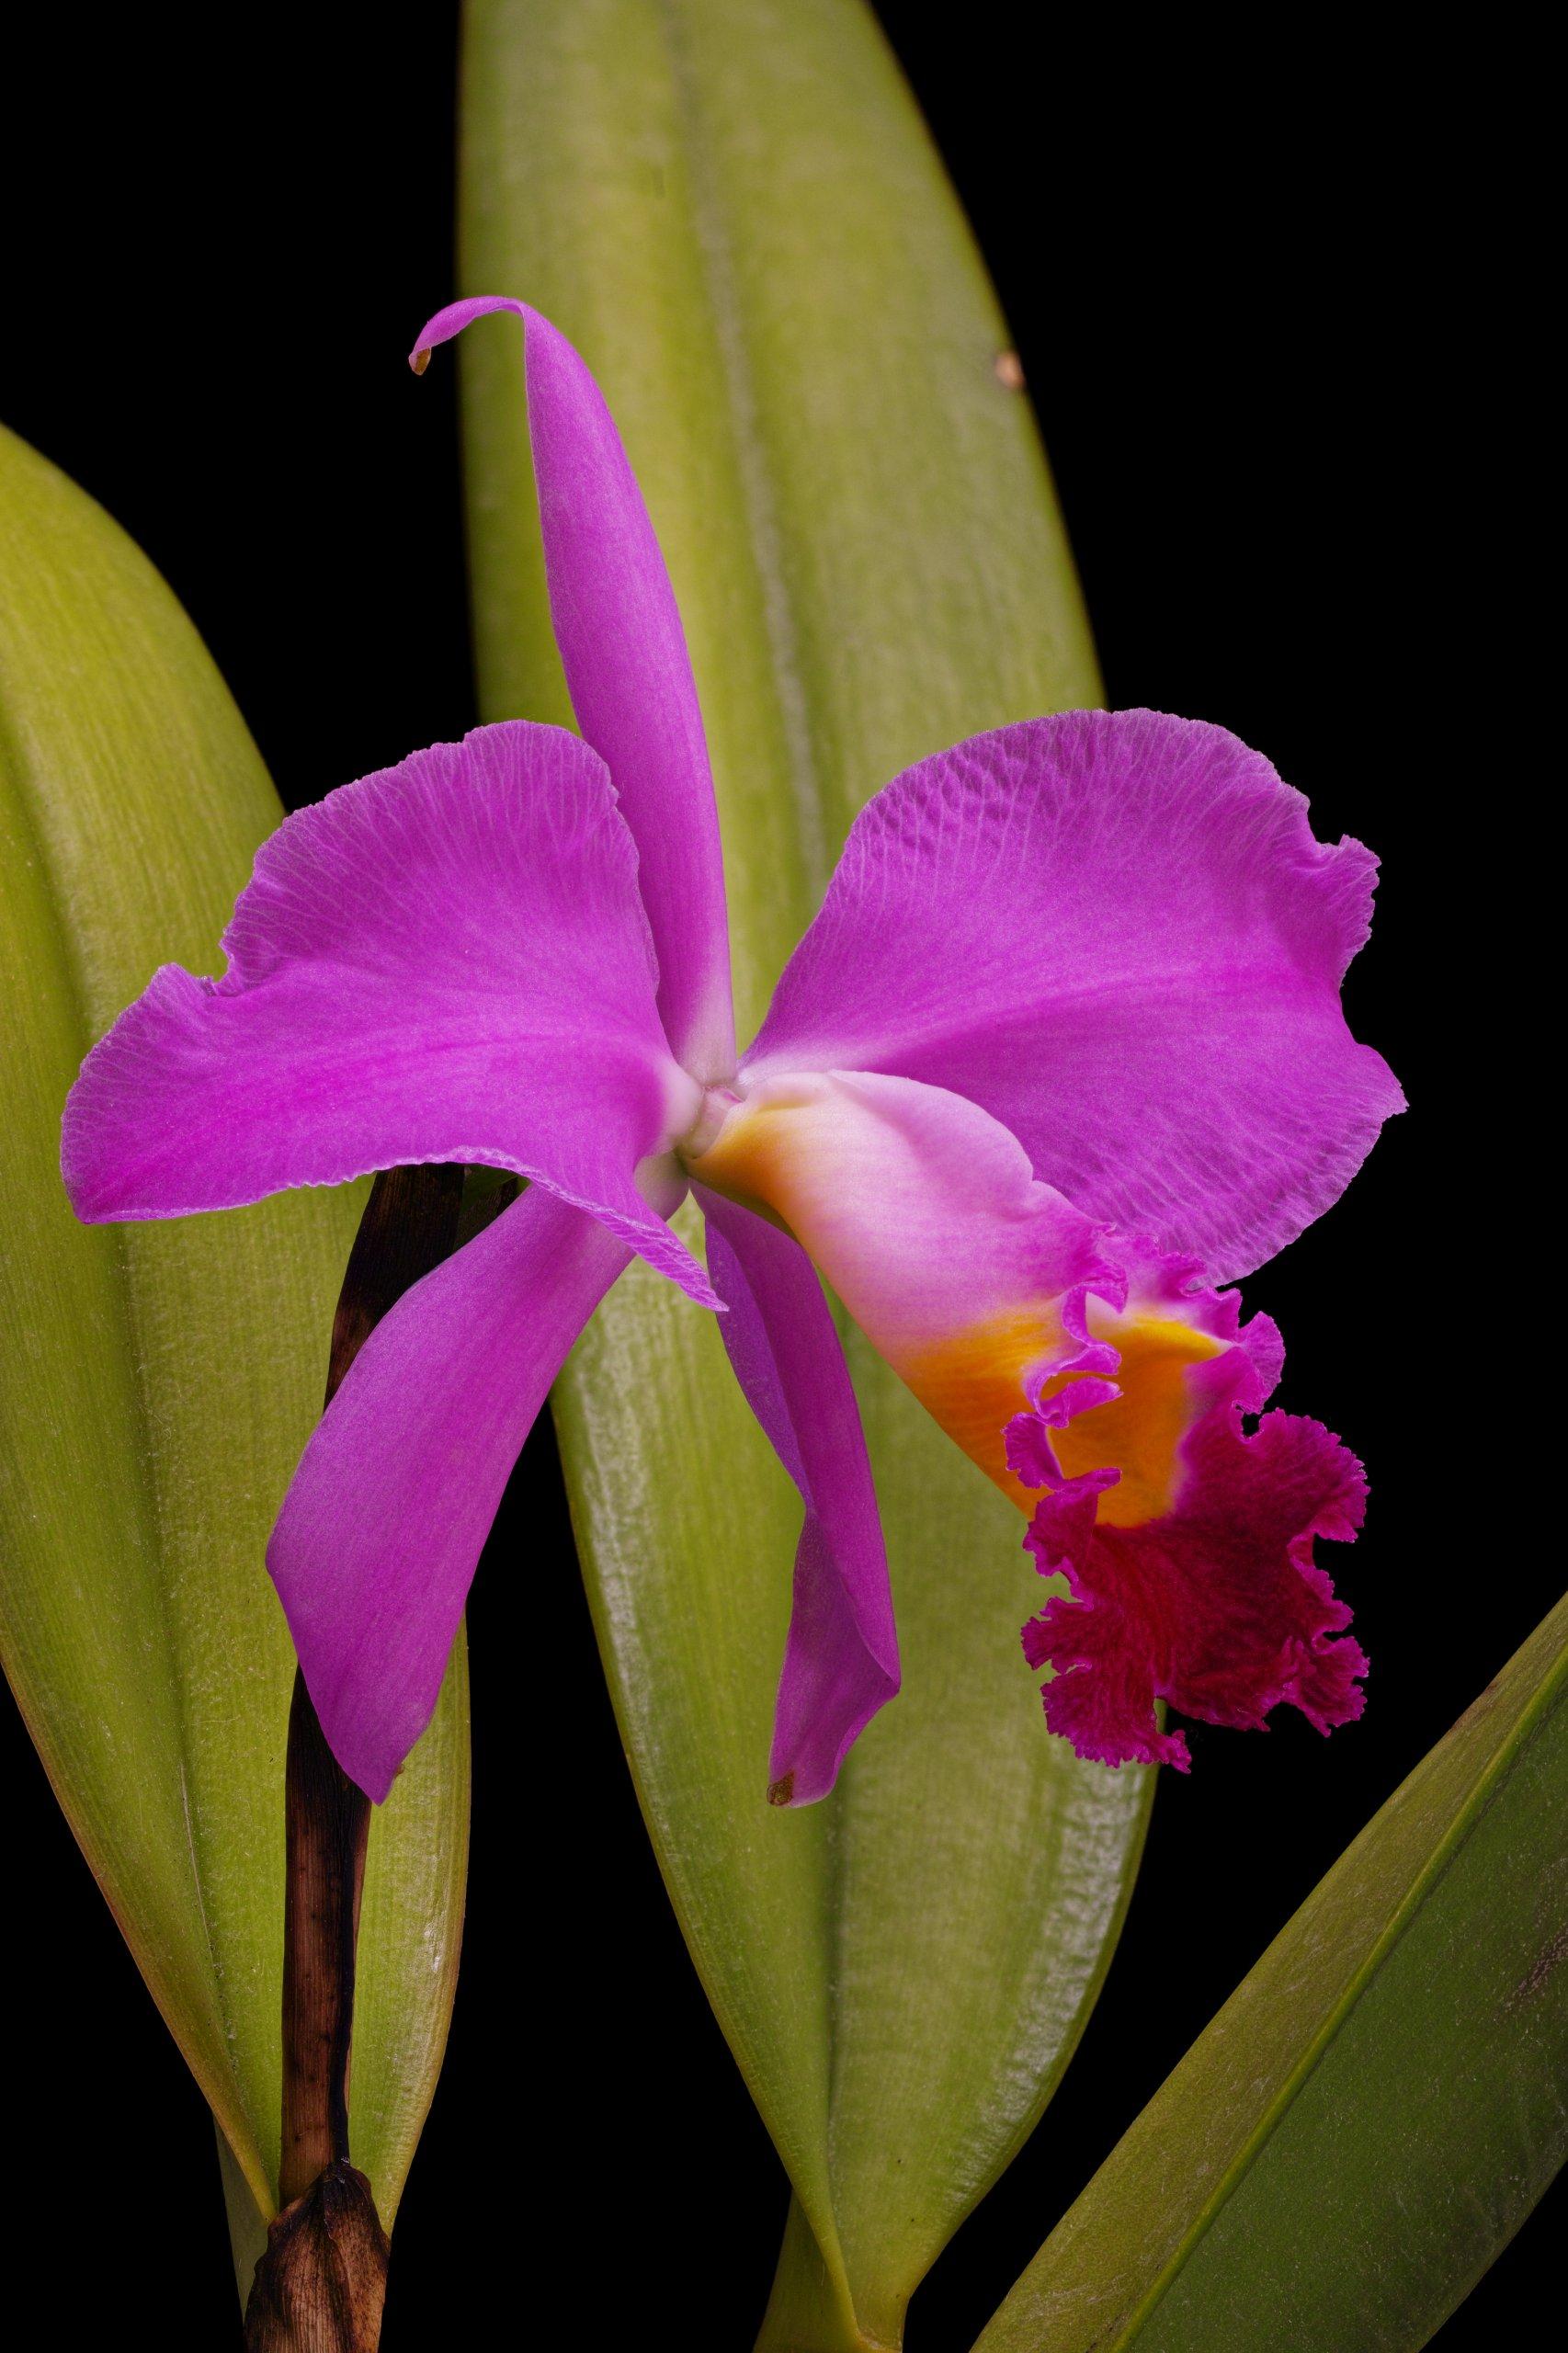 Cattleya eldorado 'M. Ito' AM-AOS BM-JOGA.tif flower (perspective).jpg